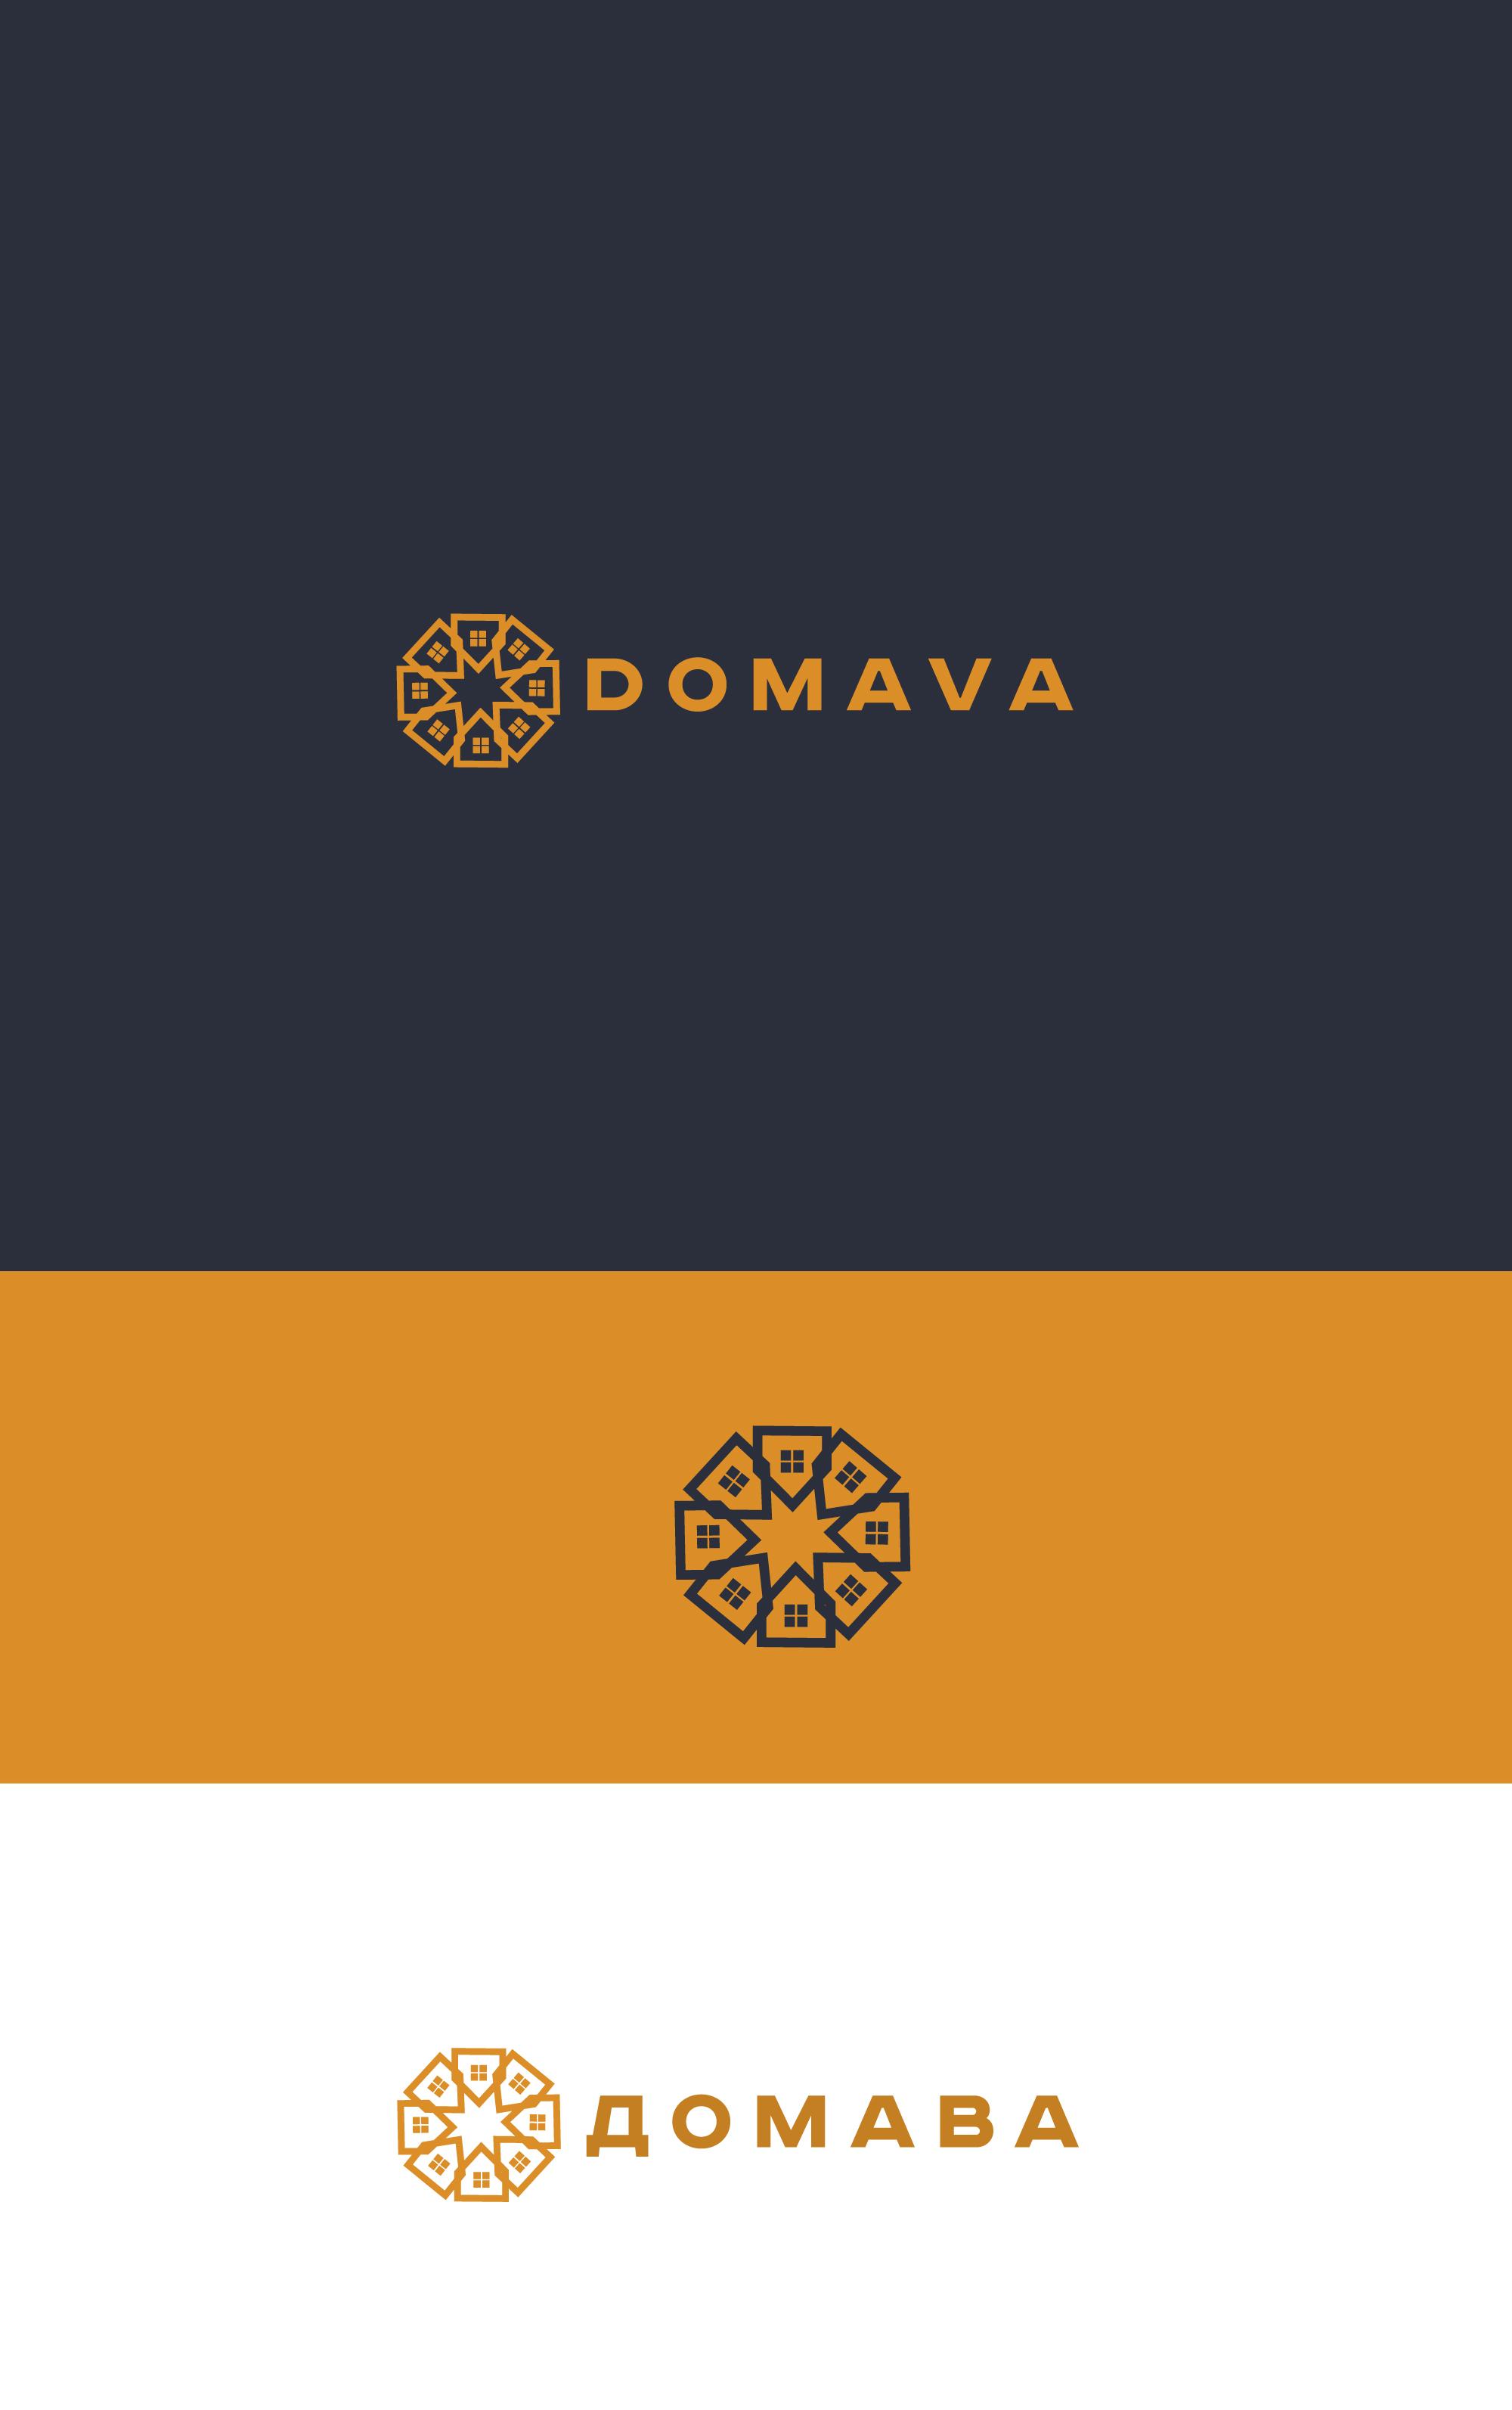 Разработка логотипа с паспортом стандартов фото f_5325ba27cd4ec636.jpg